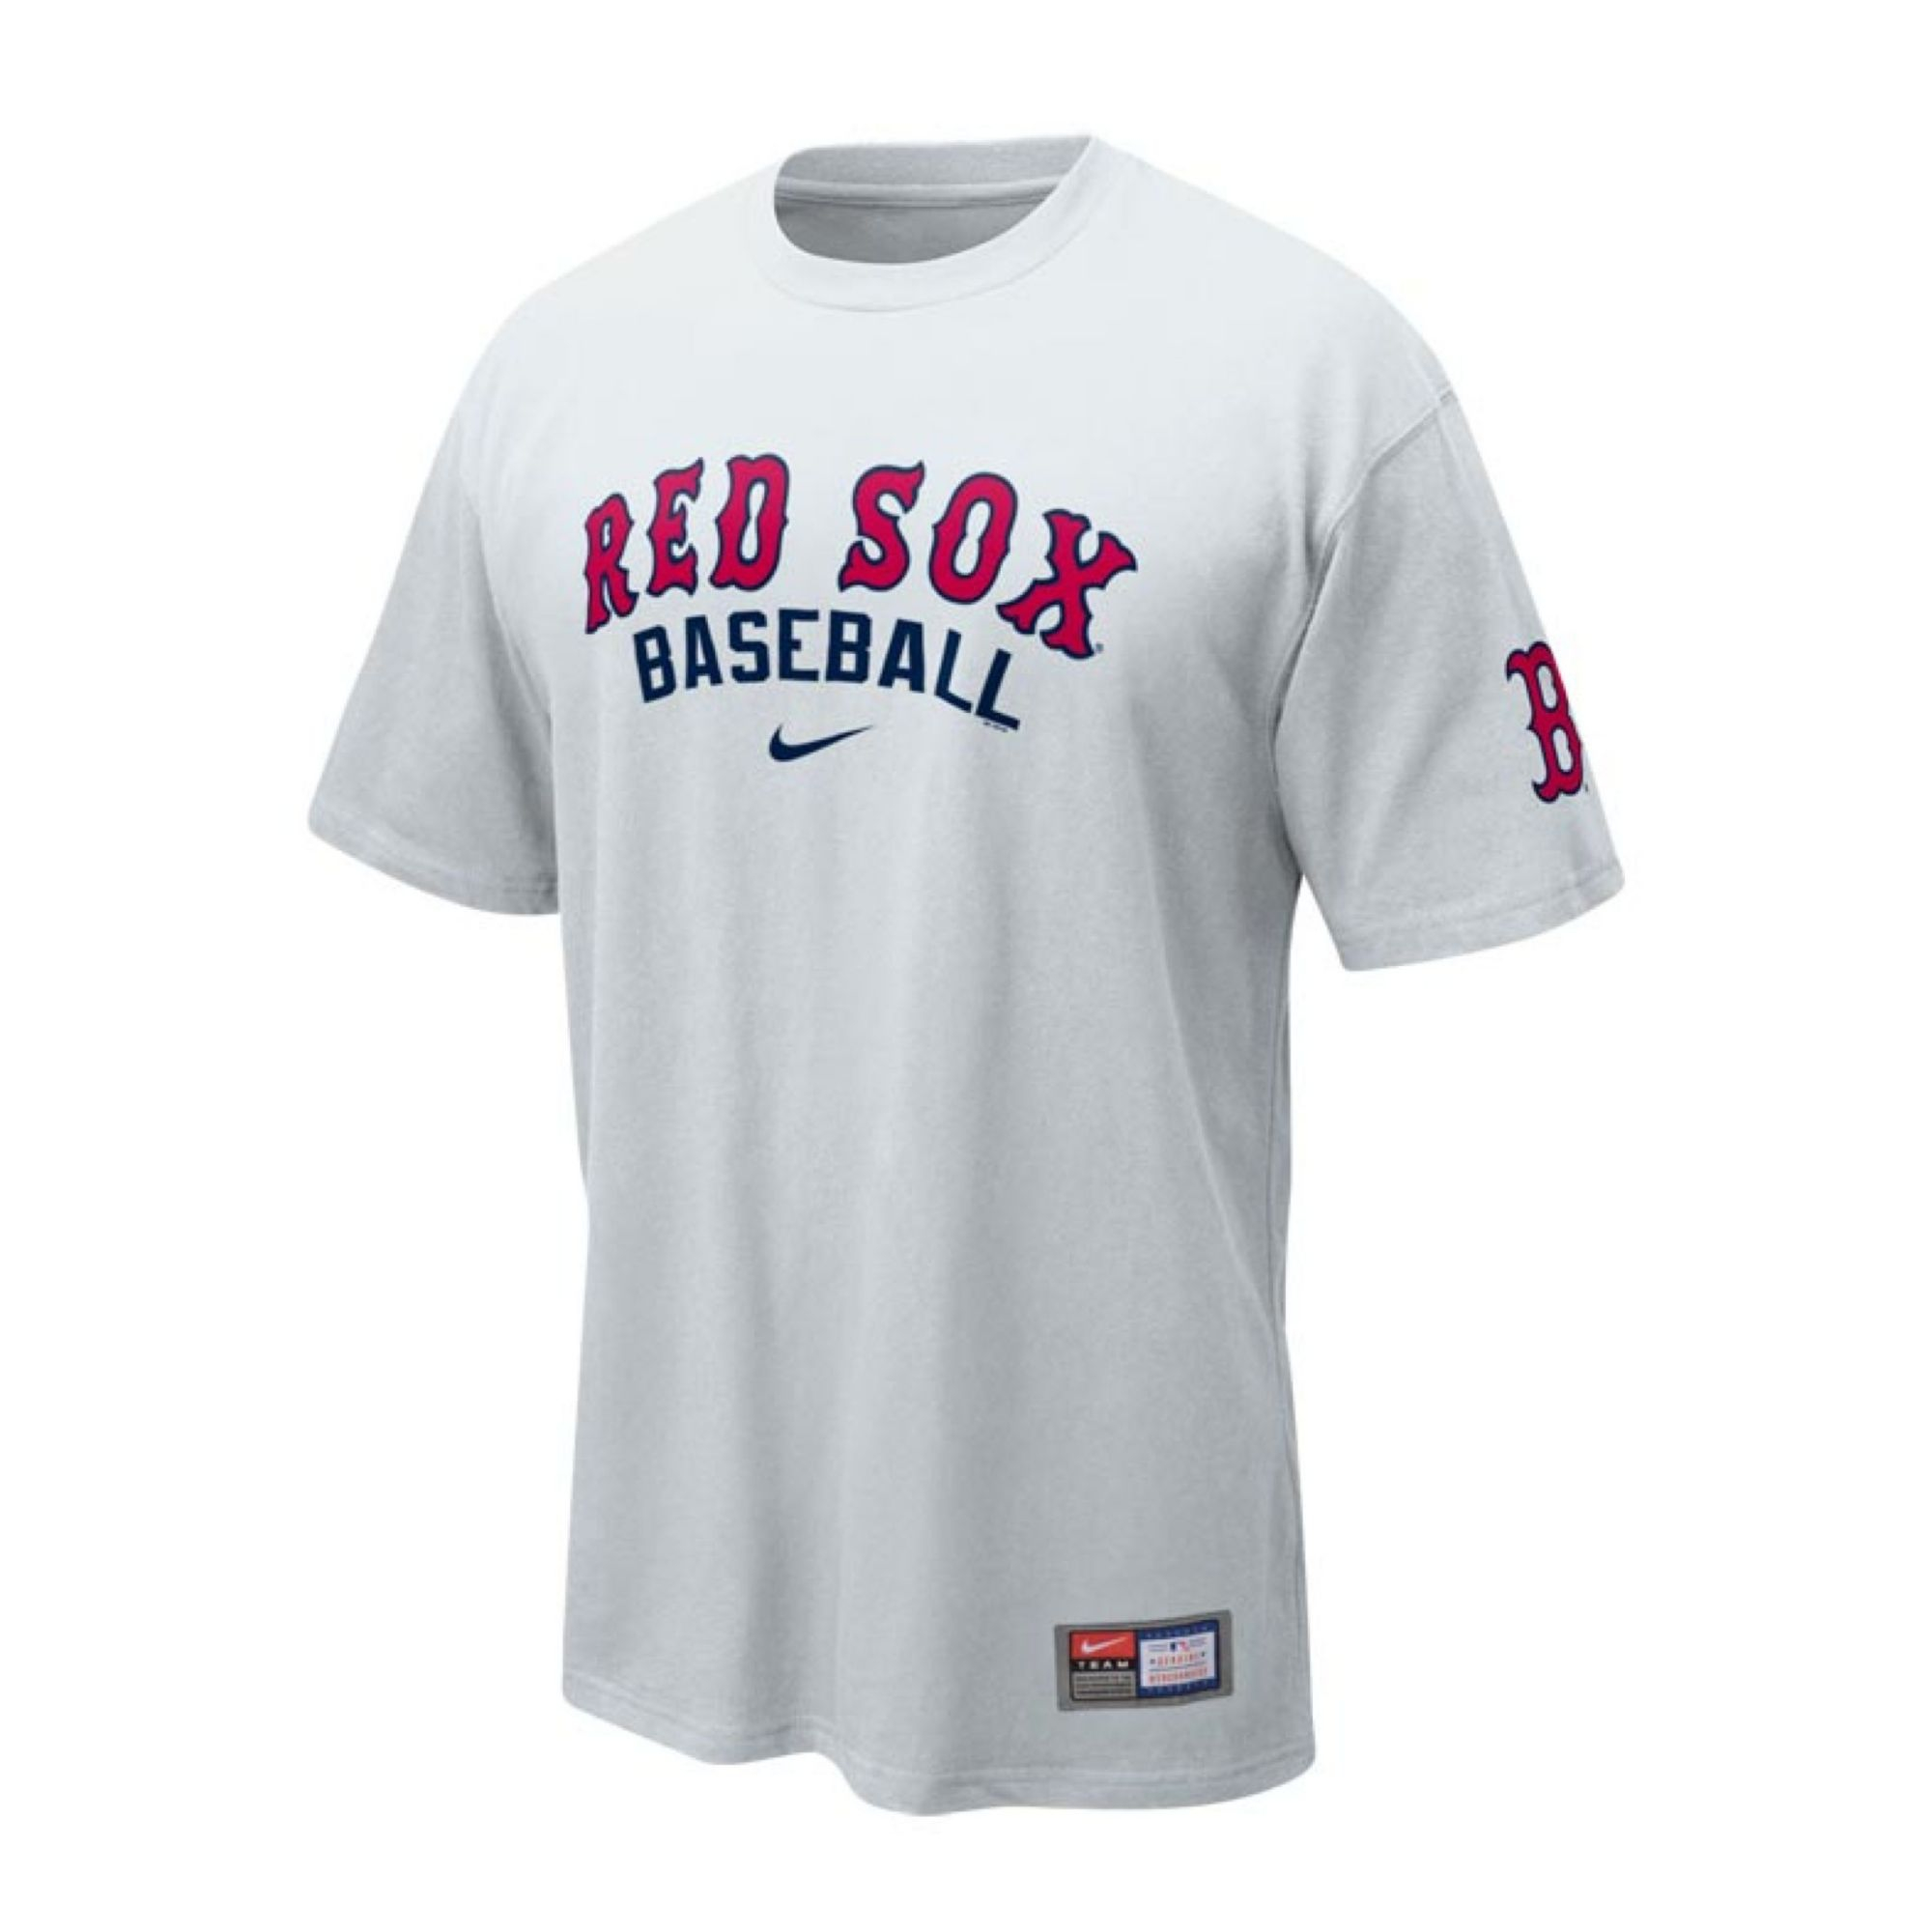 huge selection of ae7b2 53e40 Boston Red Sox Shirts Sale | Azərbaycan Dillər Universiteti